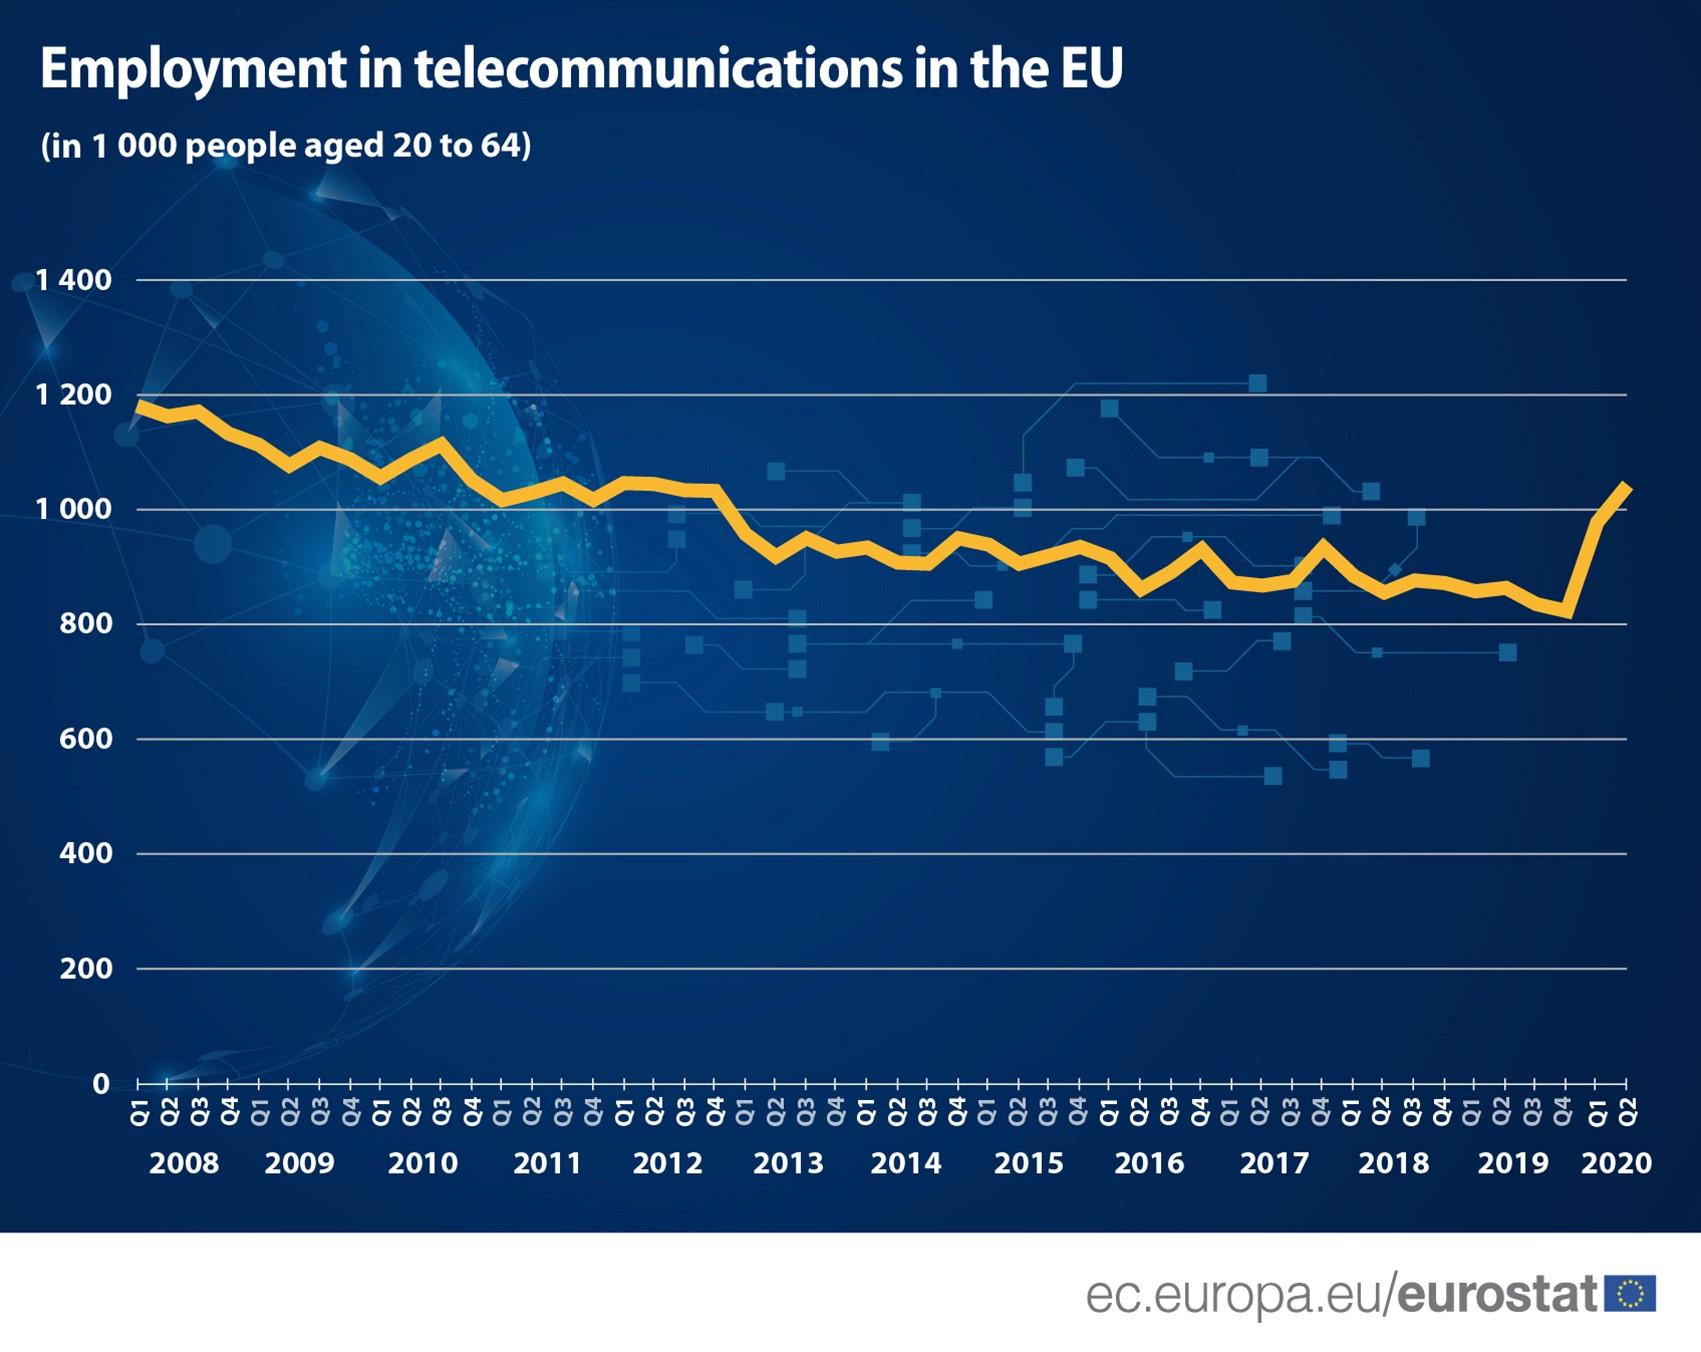 Telecommunications employment